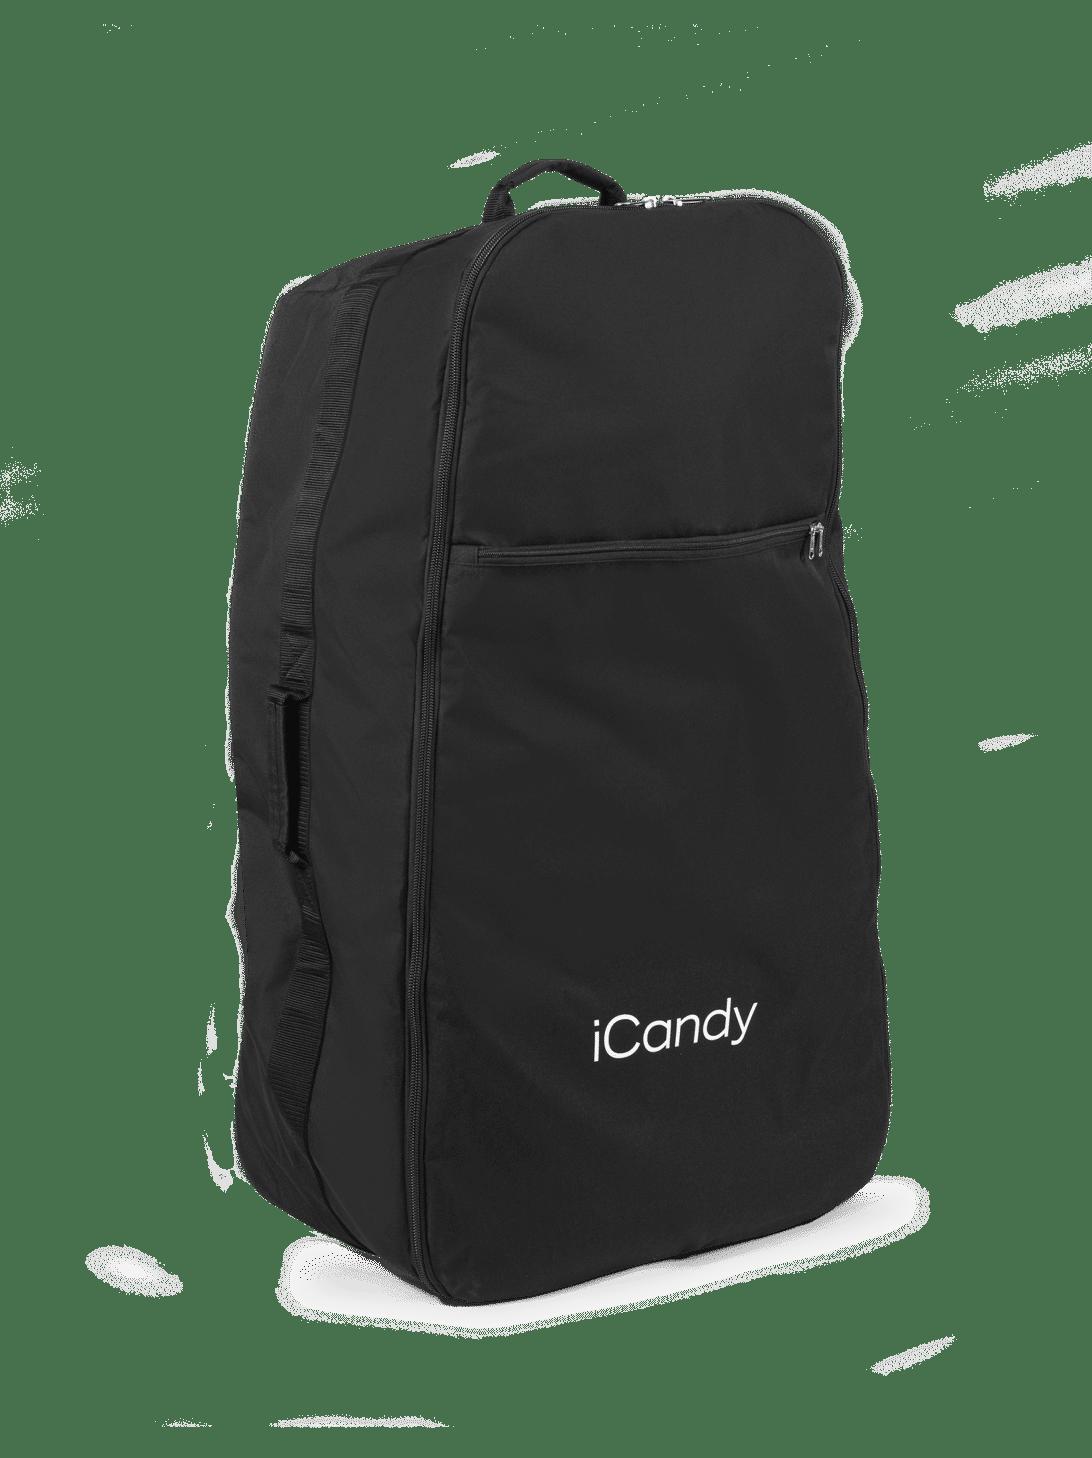 iCandy Universal Travel Bag